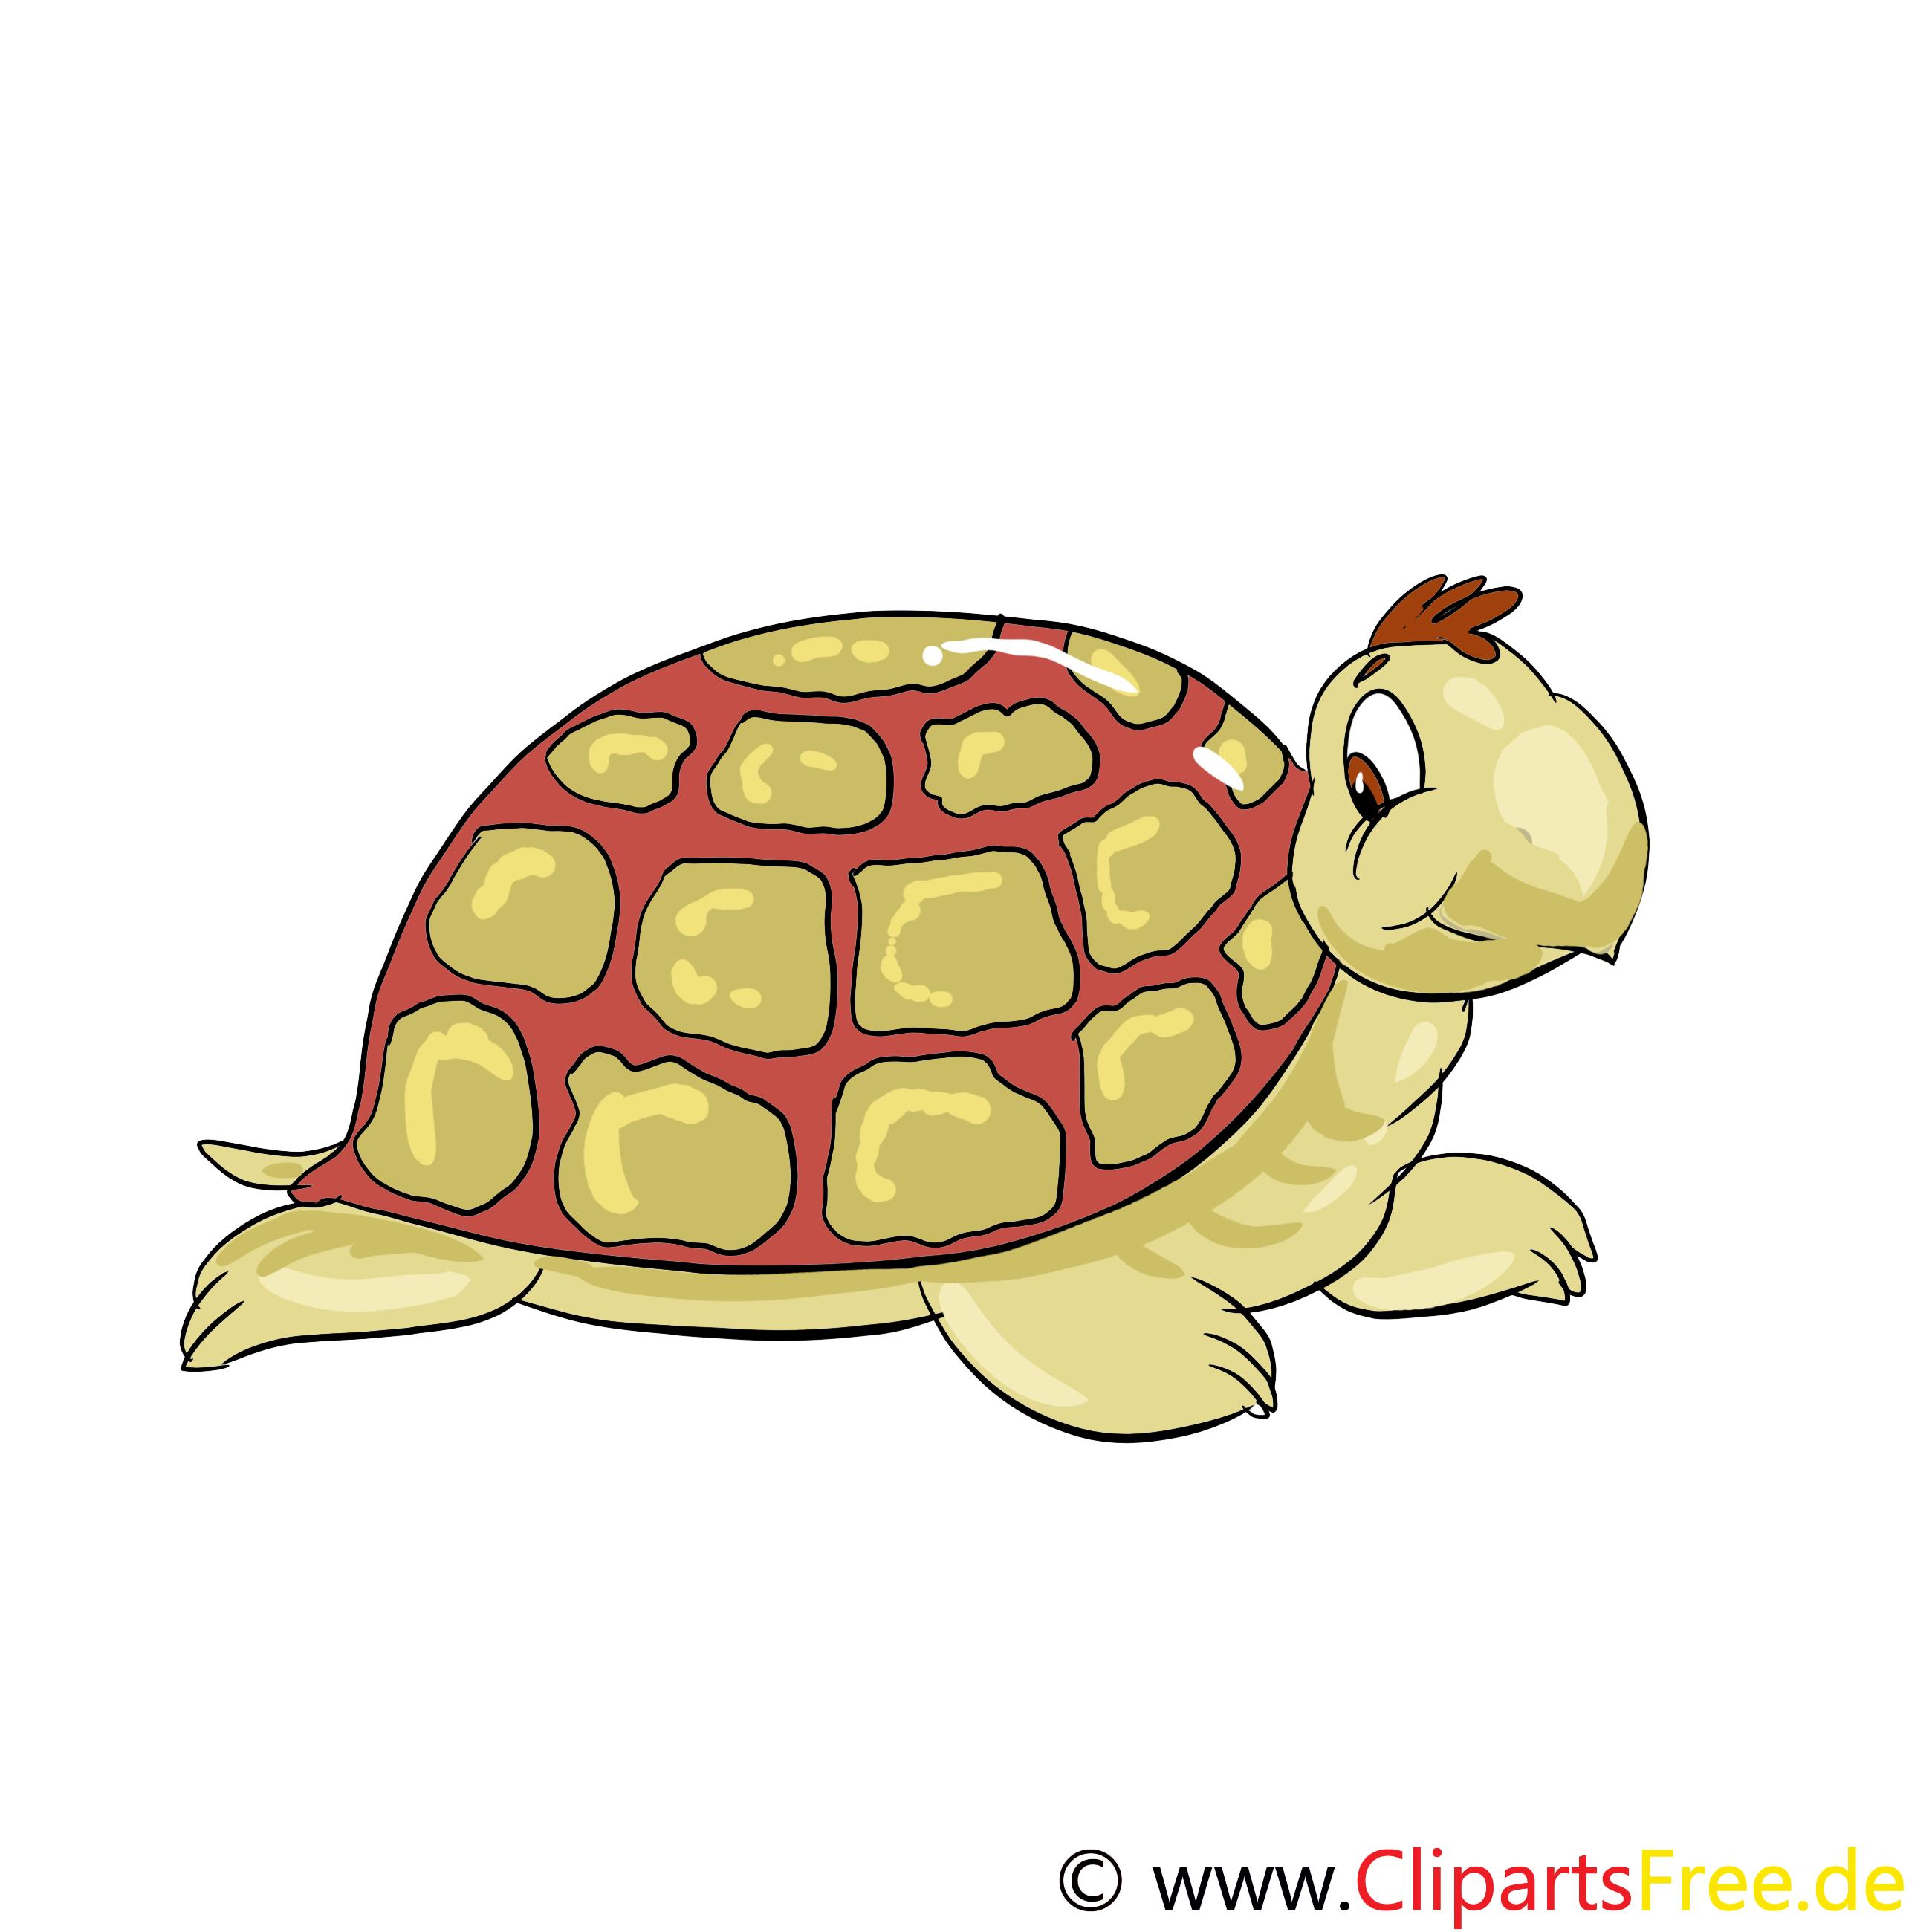 Tortue illustration – Animal images